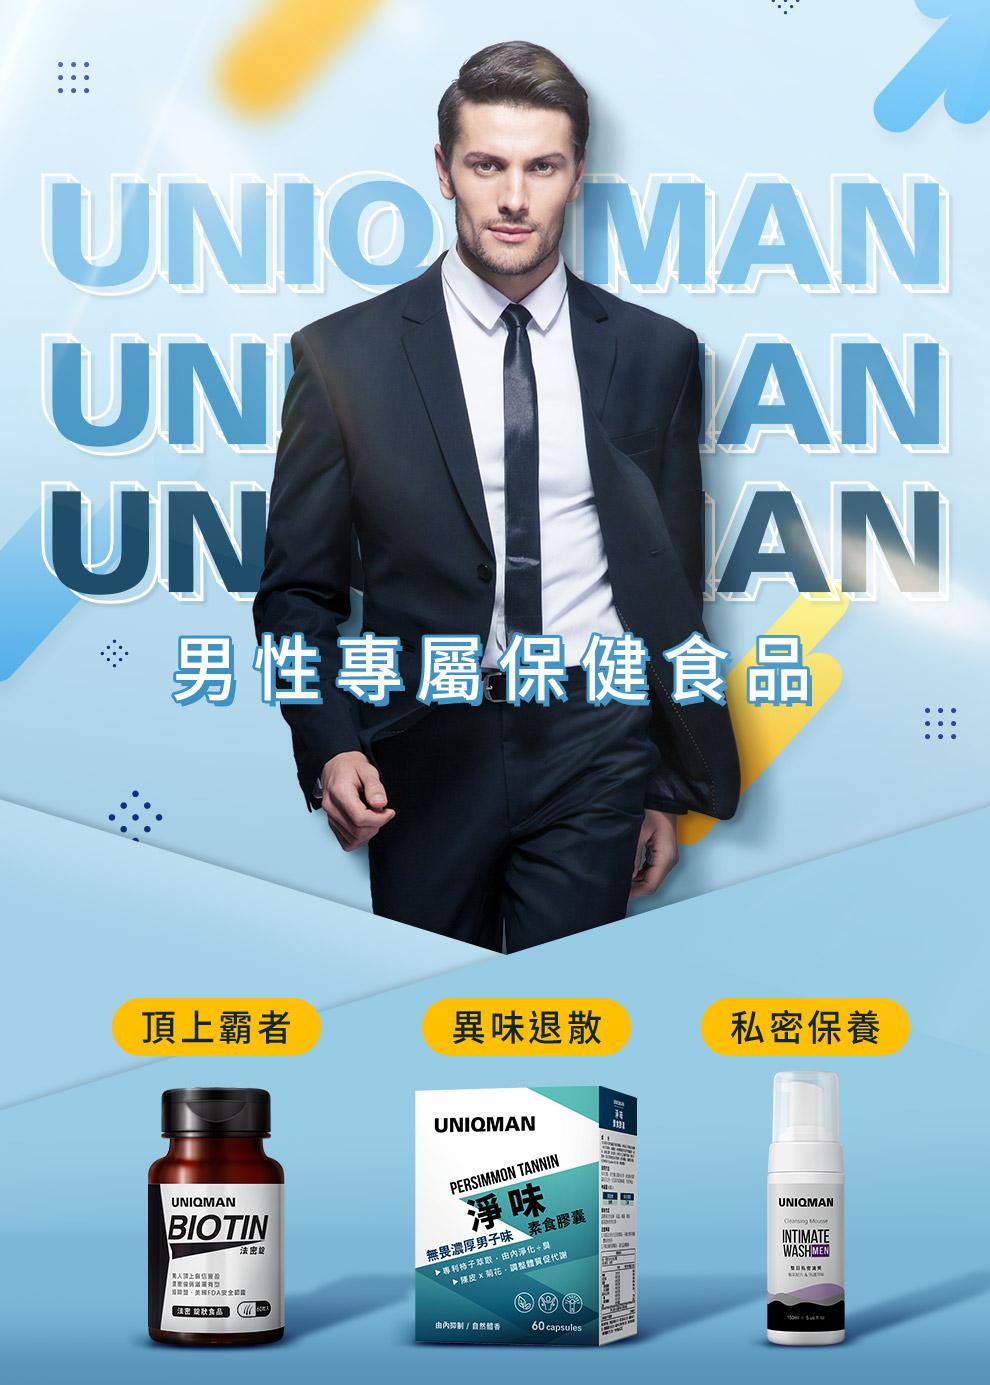 UNIQMAN男性保健,用吃來由內而外調理,維持男性生理機能、提升運動能量、打造帥氣外型。